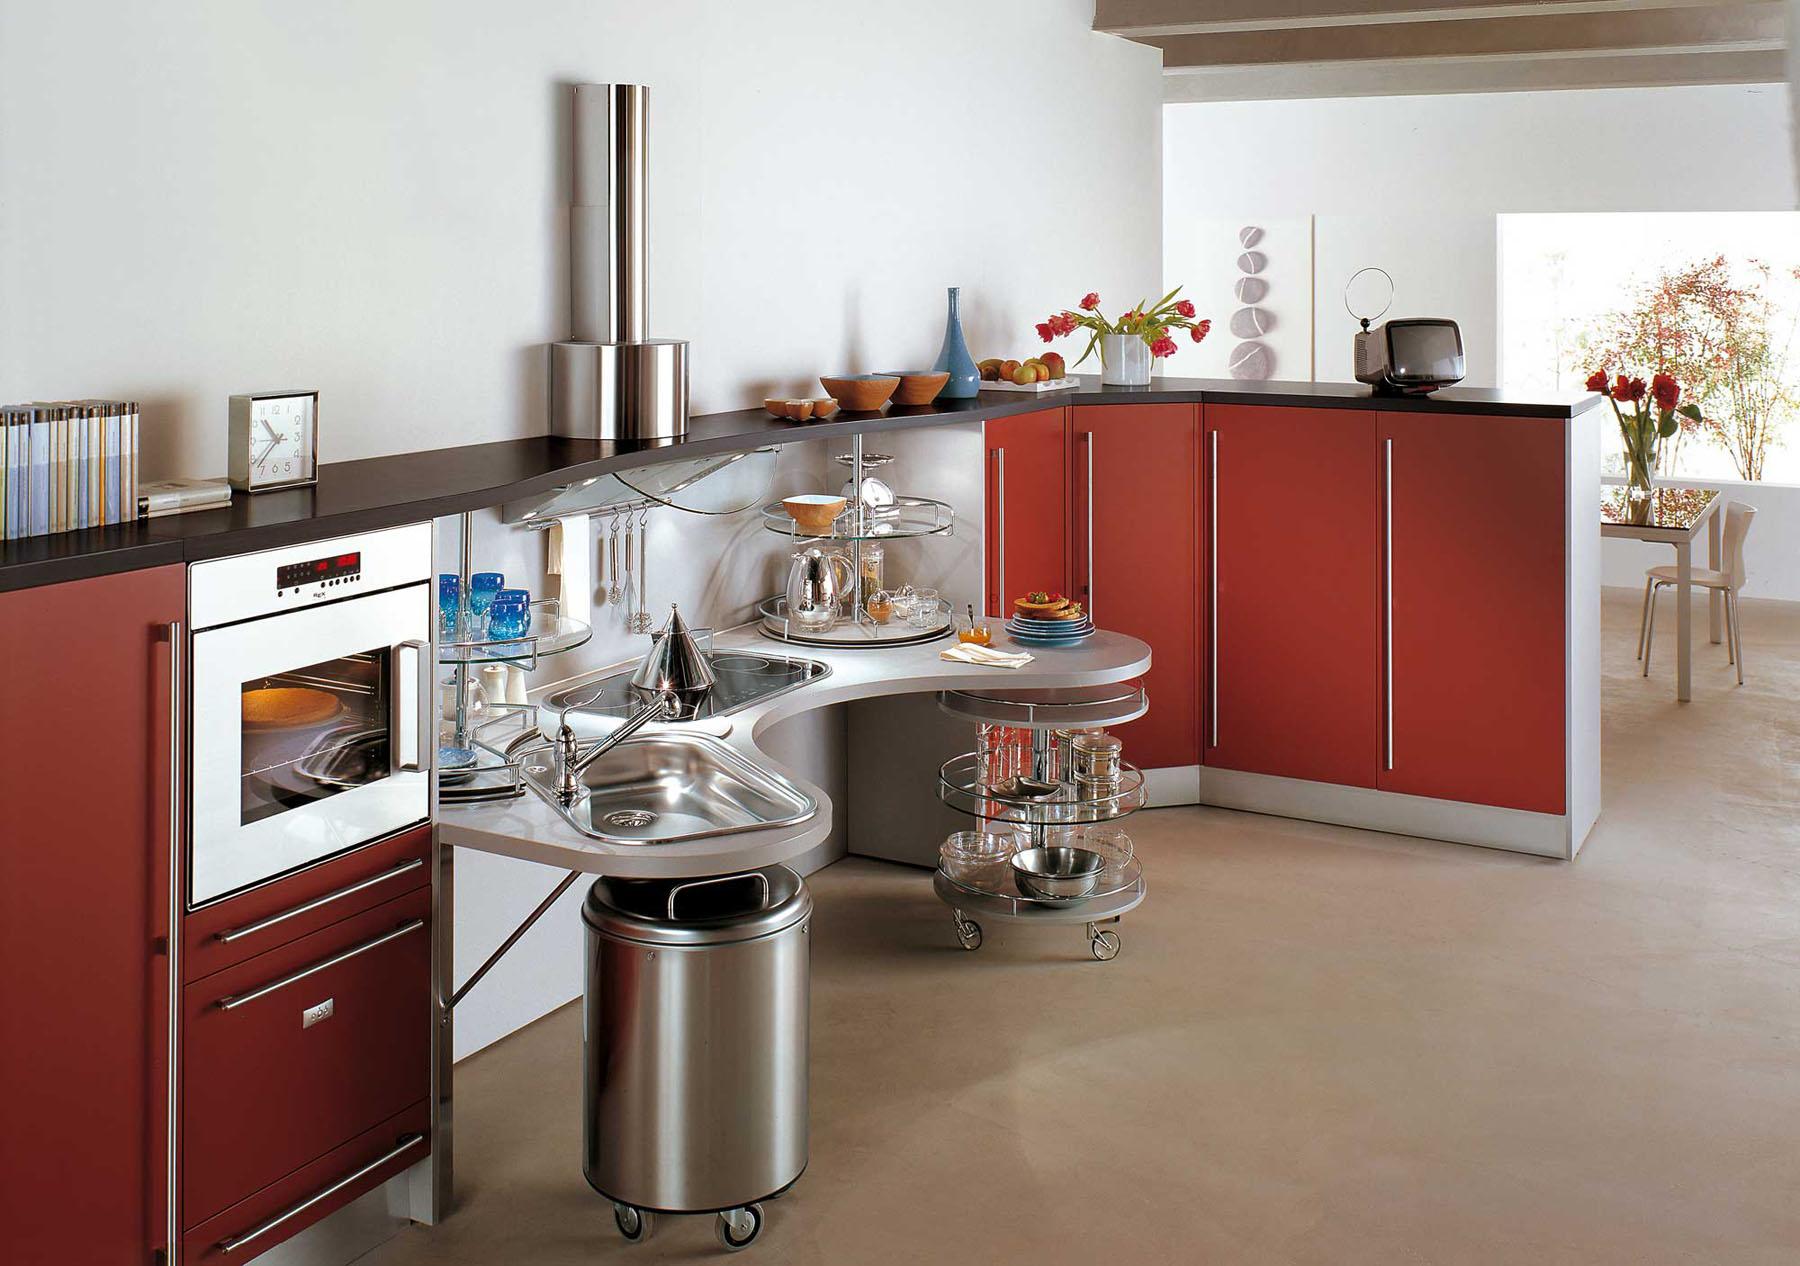 Ergonomic Italian Kitchen Design Suitable For Wheelchair Users IDesignArch Interior Design